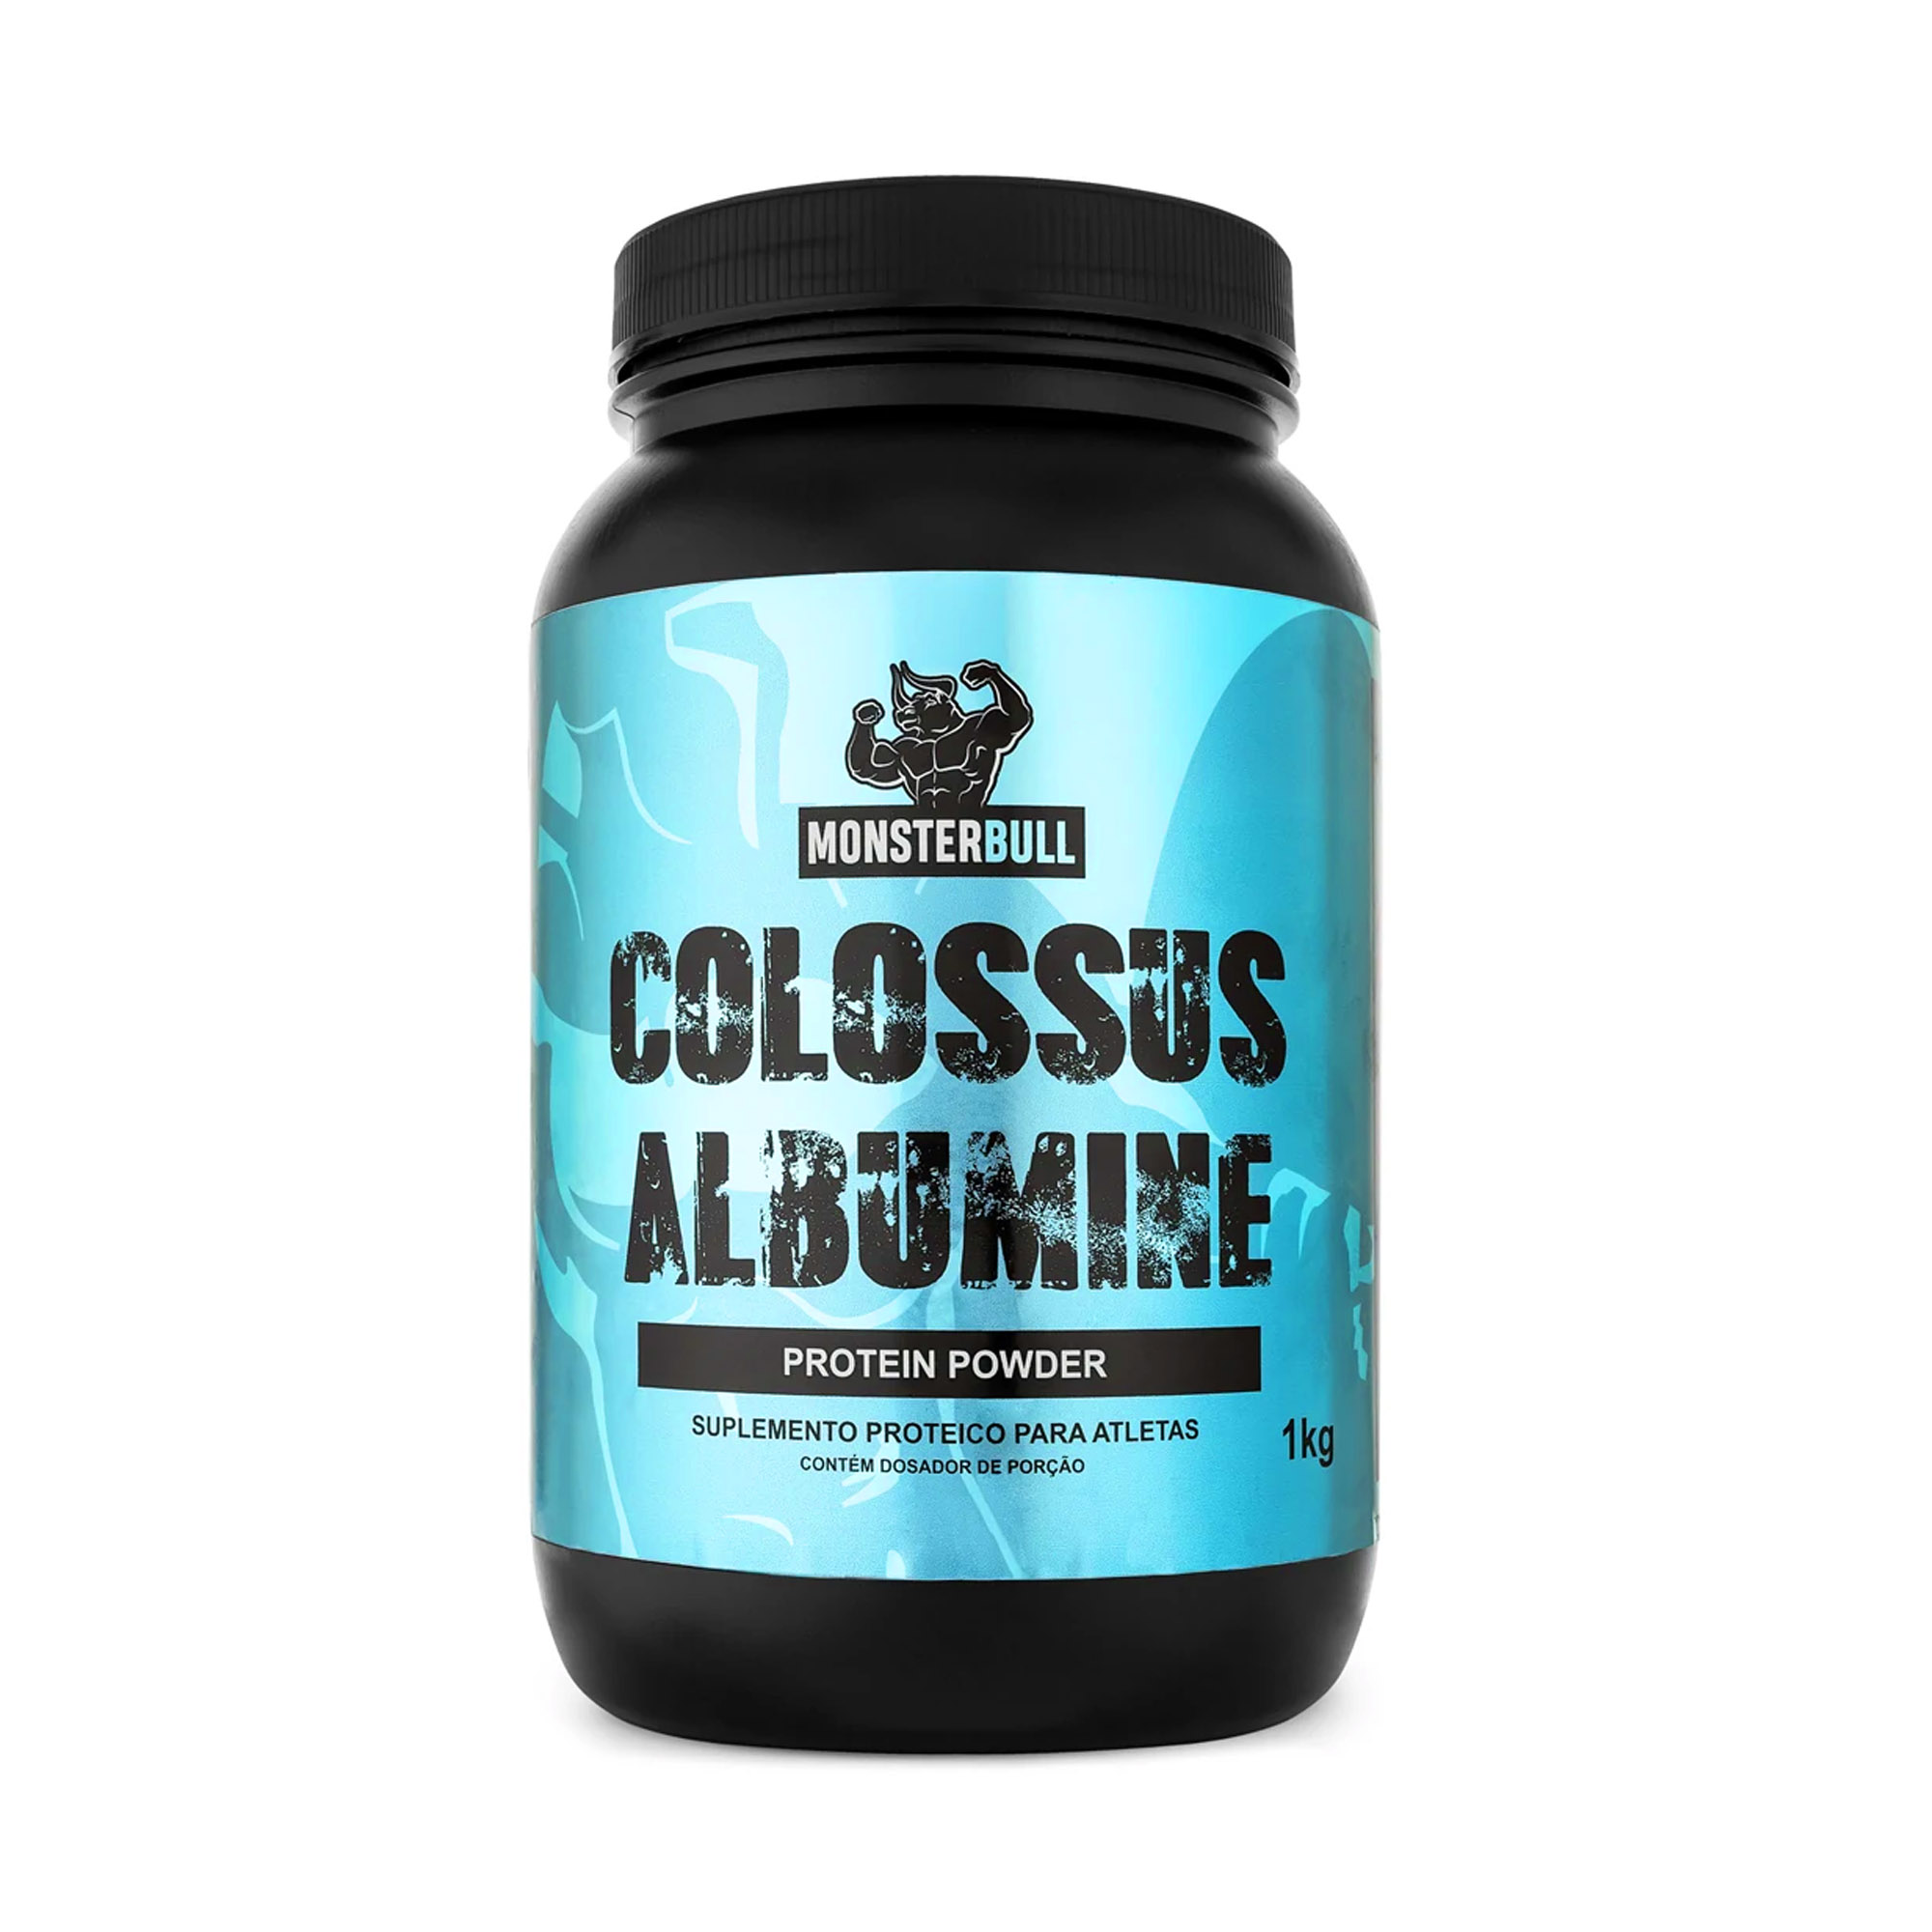 Albumina - Colossus Albumine